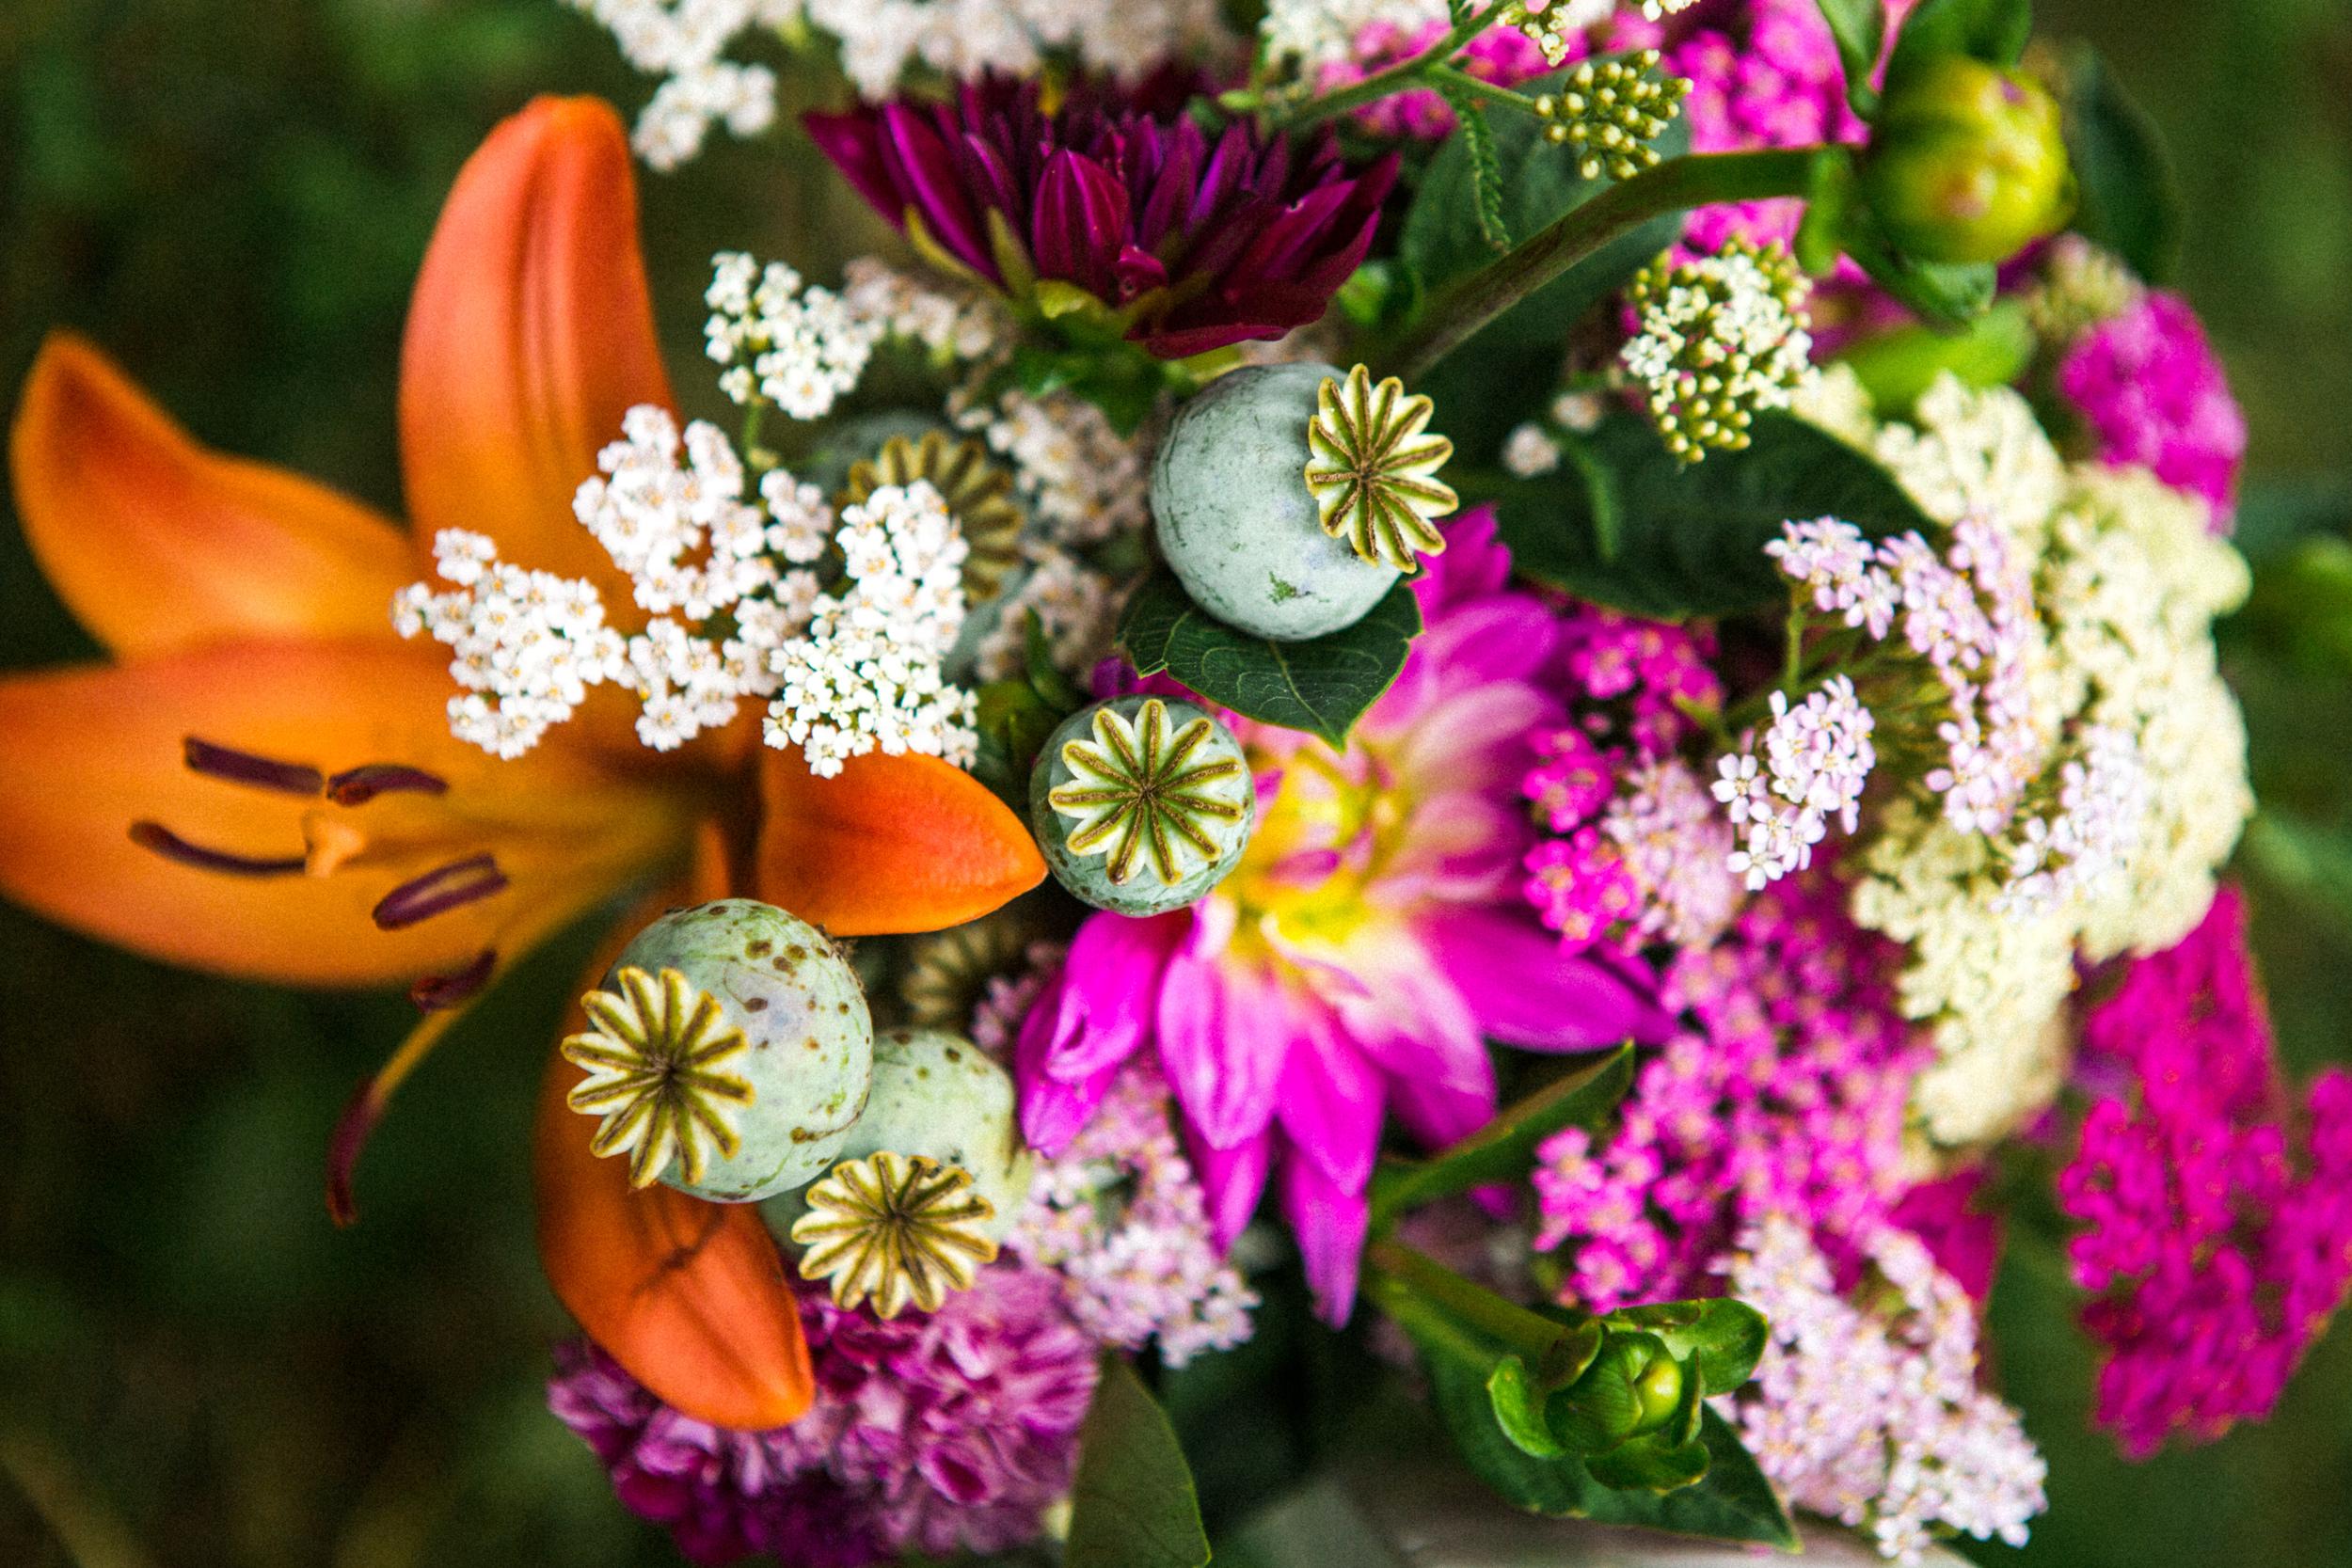 Rustic garden bouquet of poppy seeds, orange lilies, fuschia flox and white flowers.